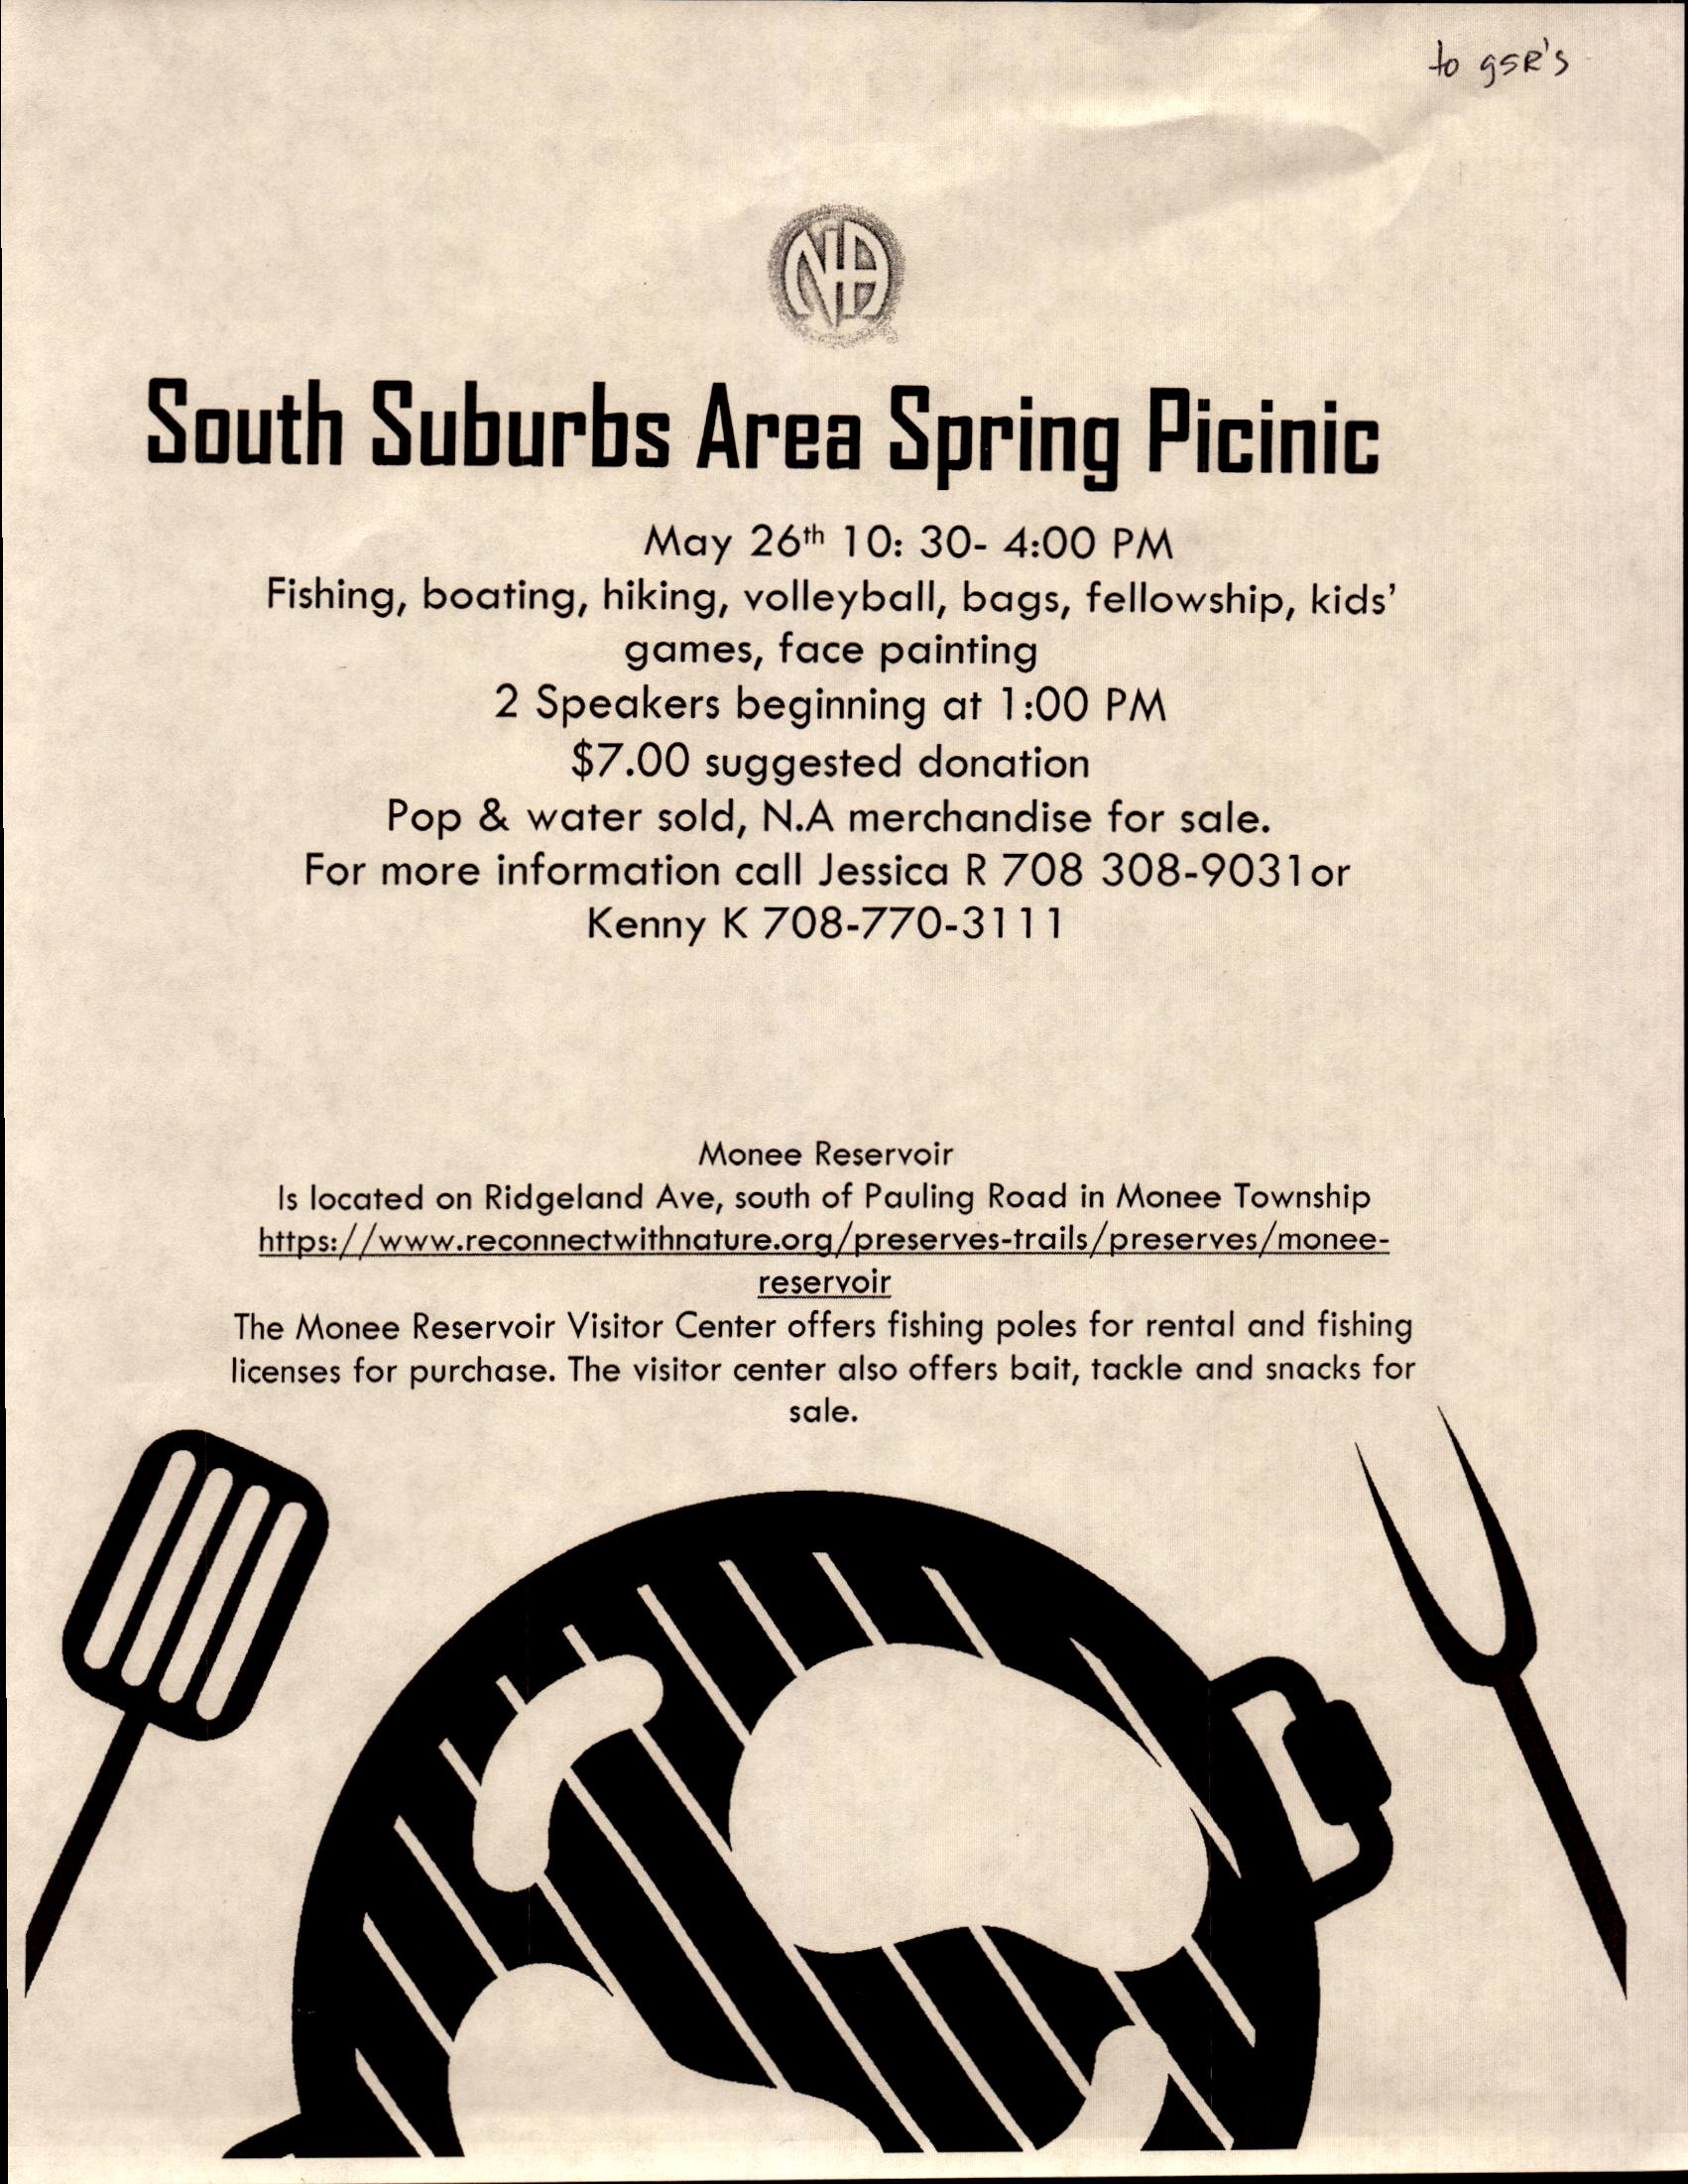 2019-05-26_South Suburbs_Area_Picknick.jpg